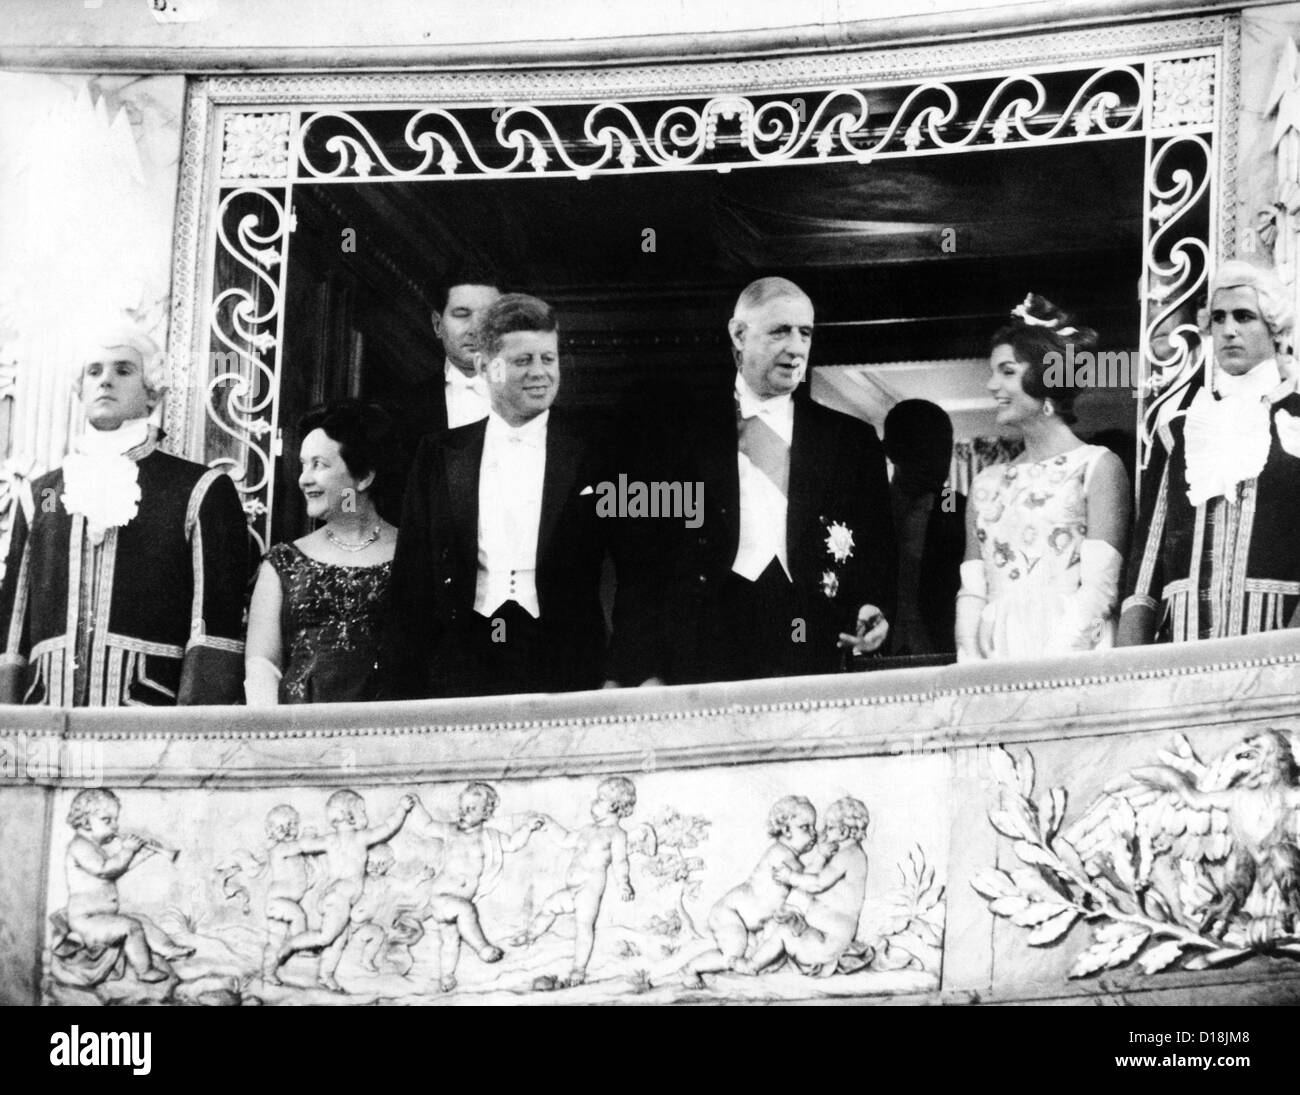 Presidente e Jacqueline Kennedy presso il Palazzo di Versailles. Madame  Yvonne de Gaulle  Pres. John Kennedy  Pres. Charles de b95a1cebb5b